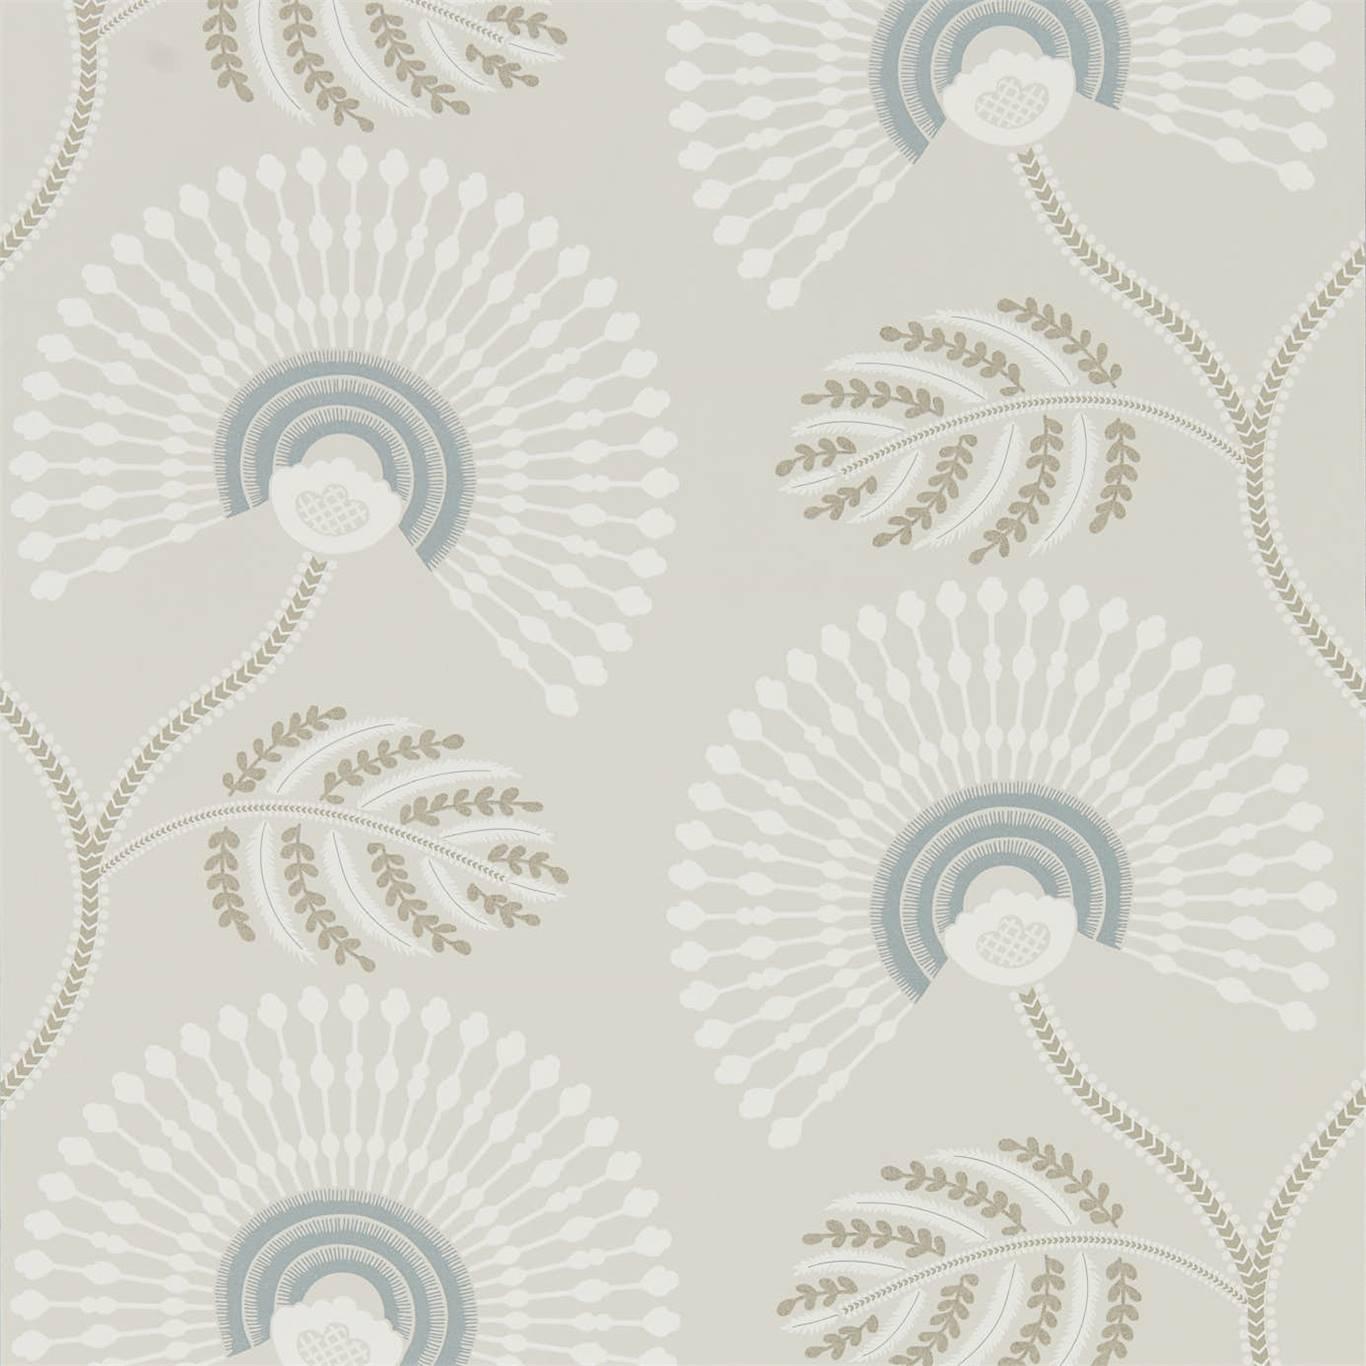 Image of Harlequin Louella Seaglass/Pearl Wallpaper 111910